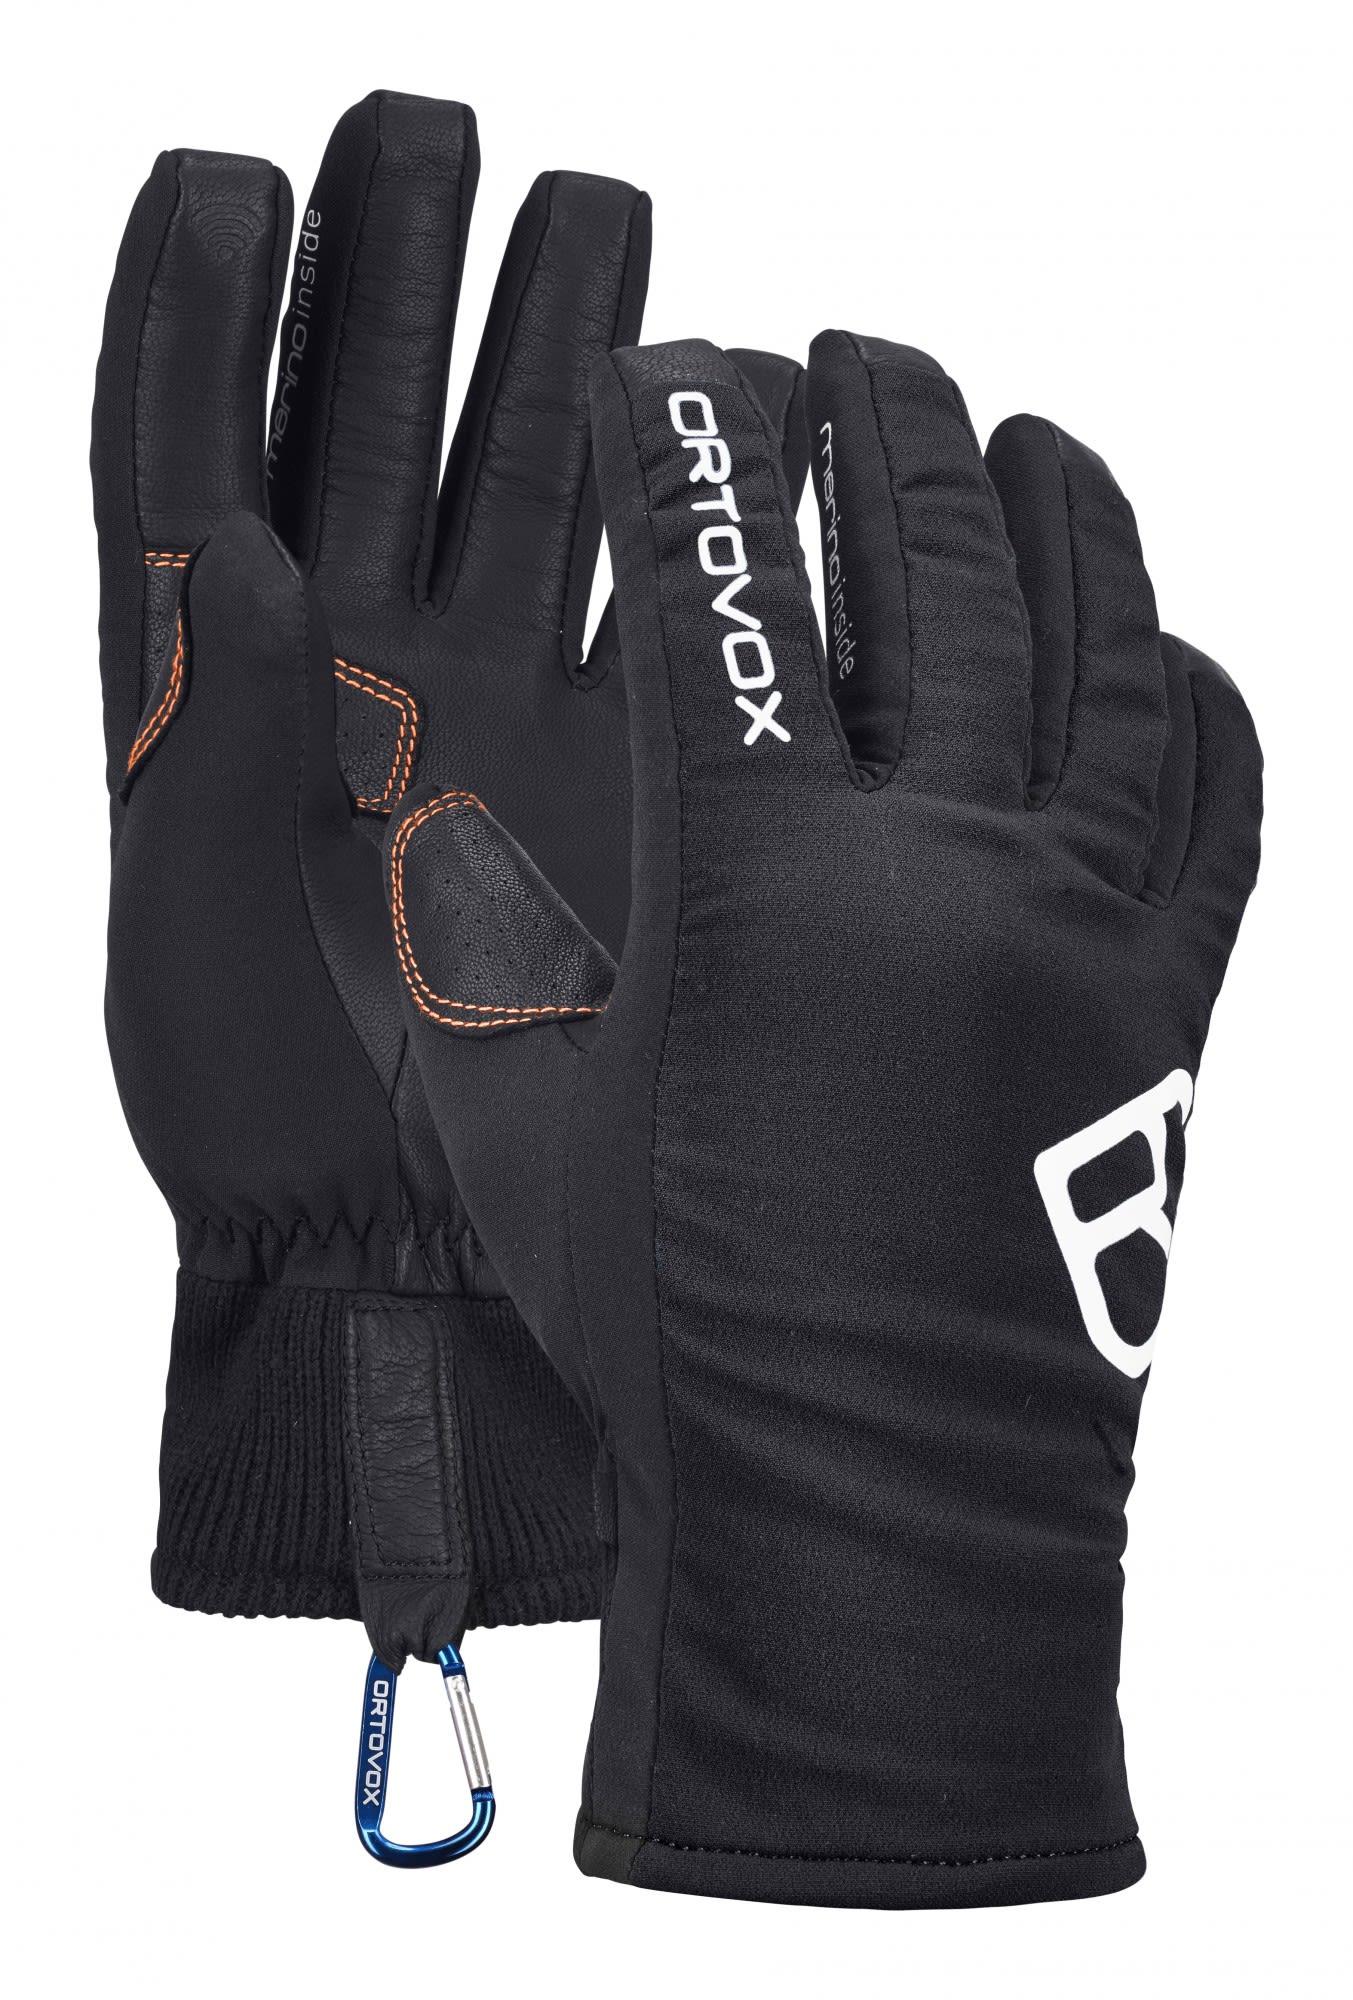 Ortovox Tour Glove Schwarz, Male Merino Accessoires, S